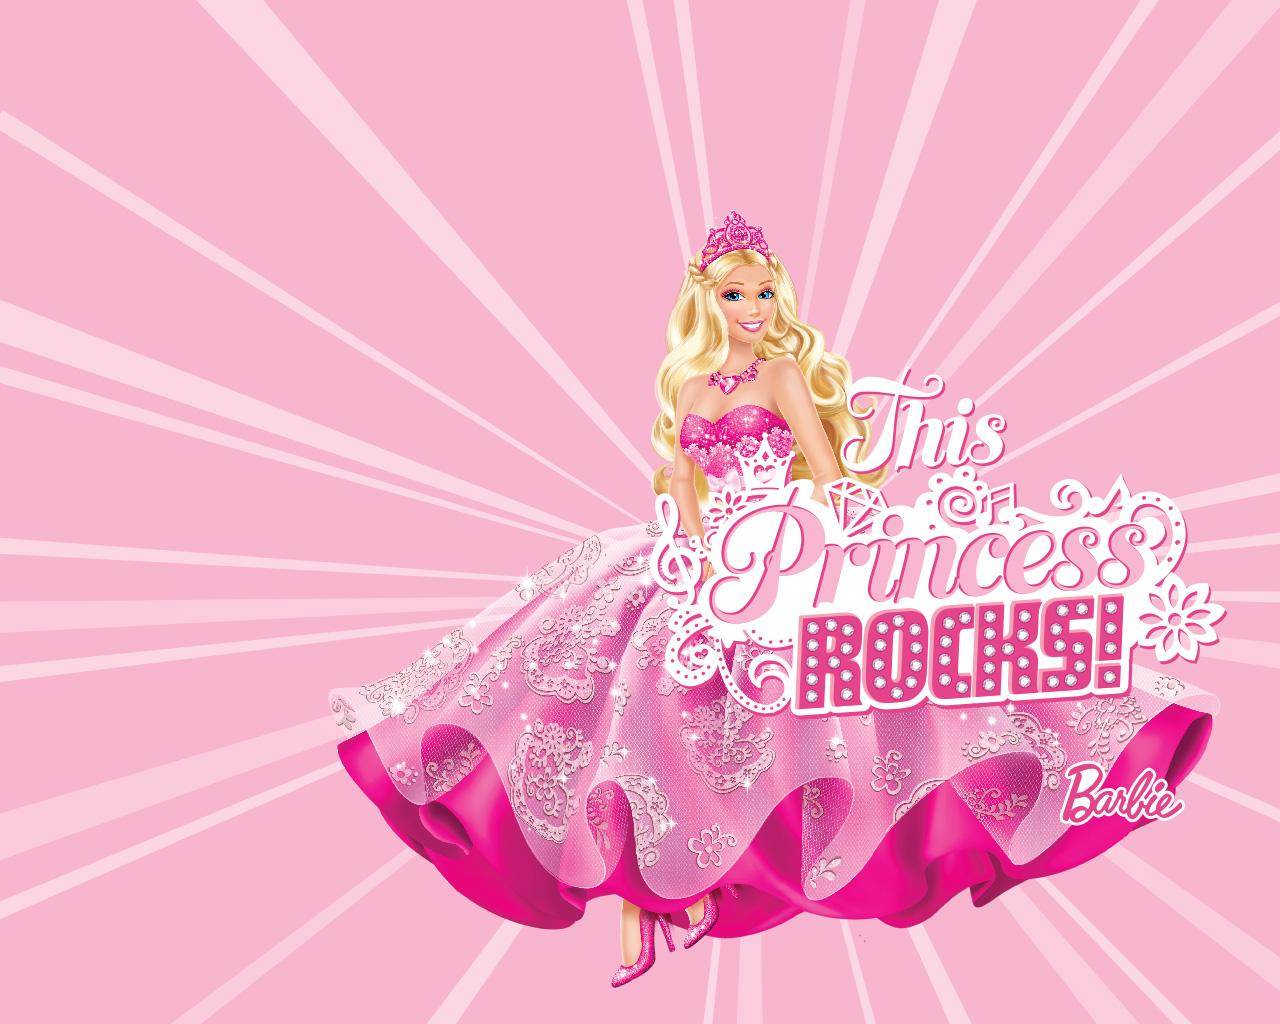 Princess Barbie Wallpaper Desktop Wallpaper WallpaperLepi 1280x1024